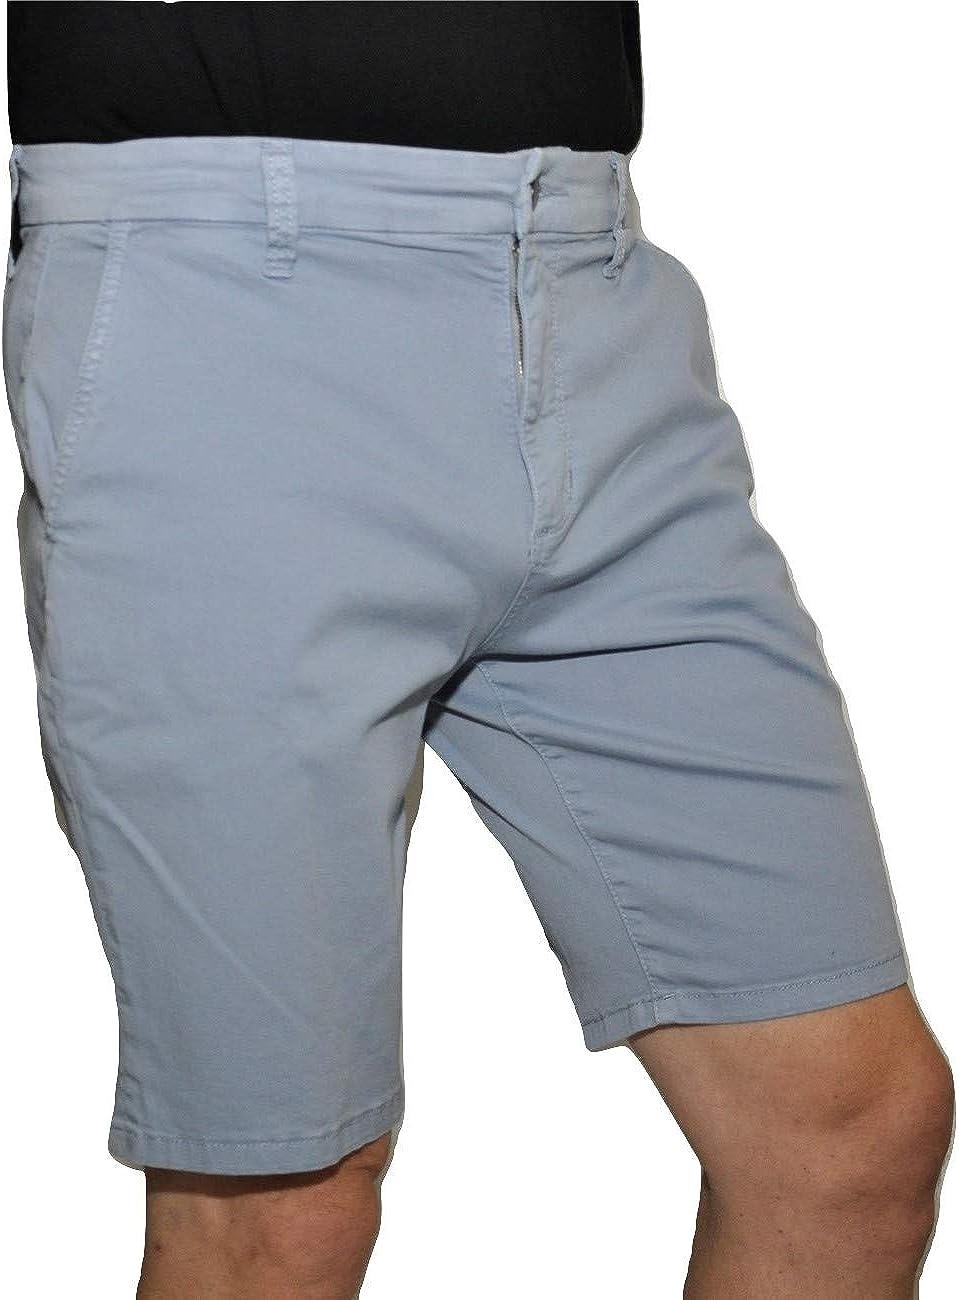 Joes Jeans Trouser Four Pocket Shorts